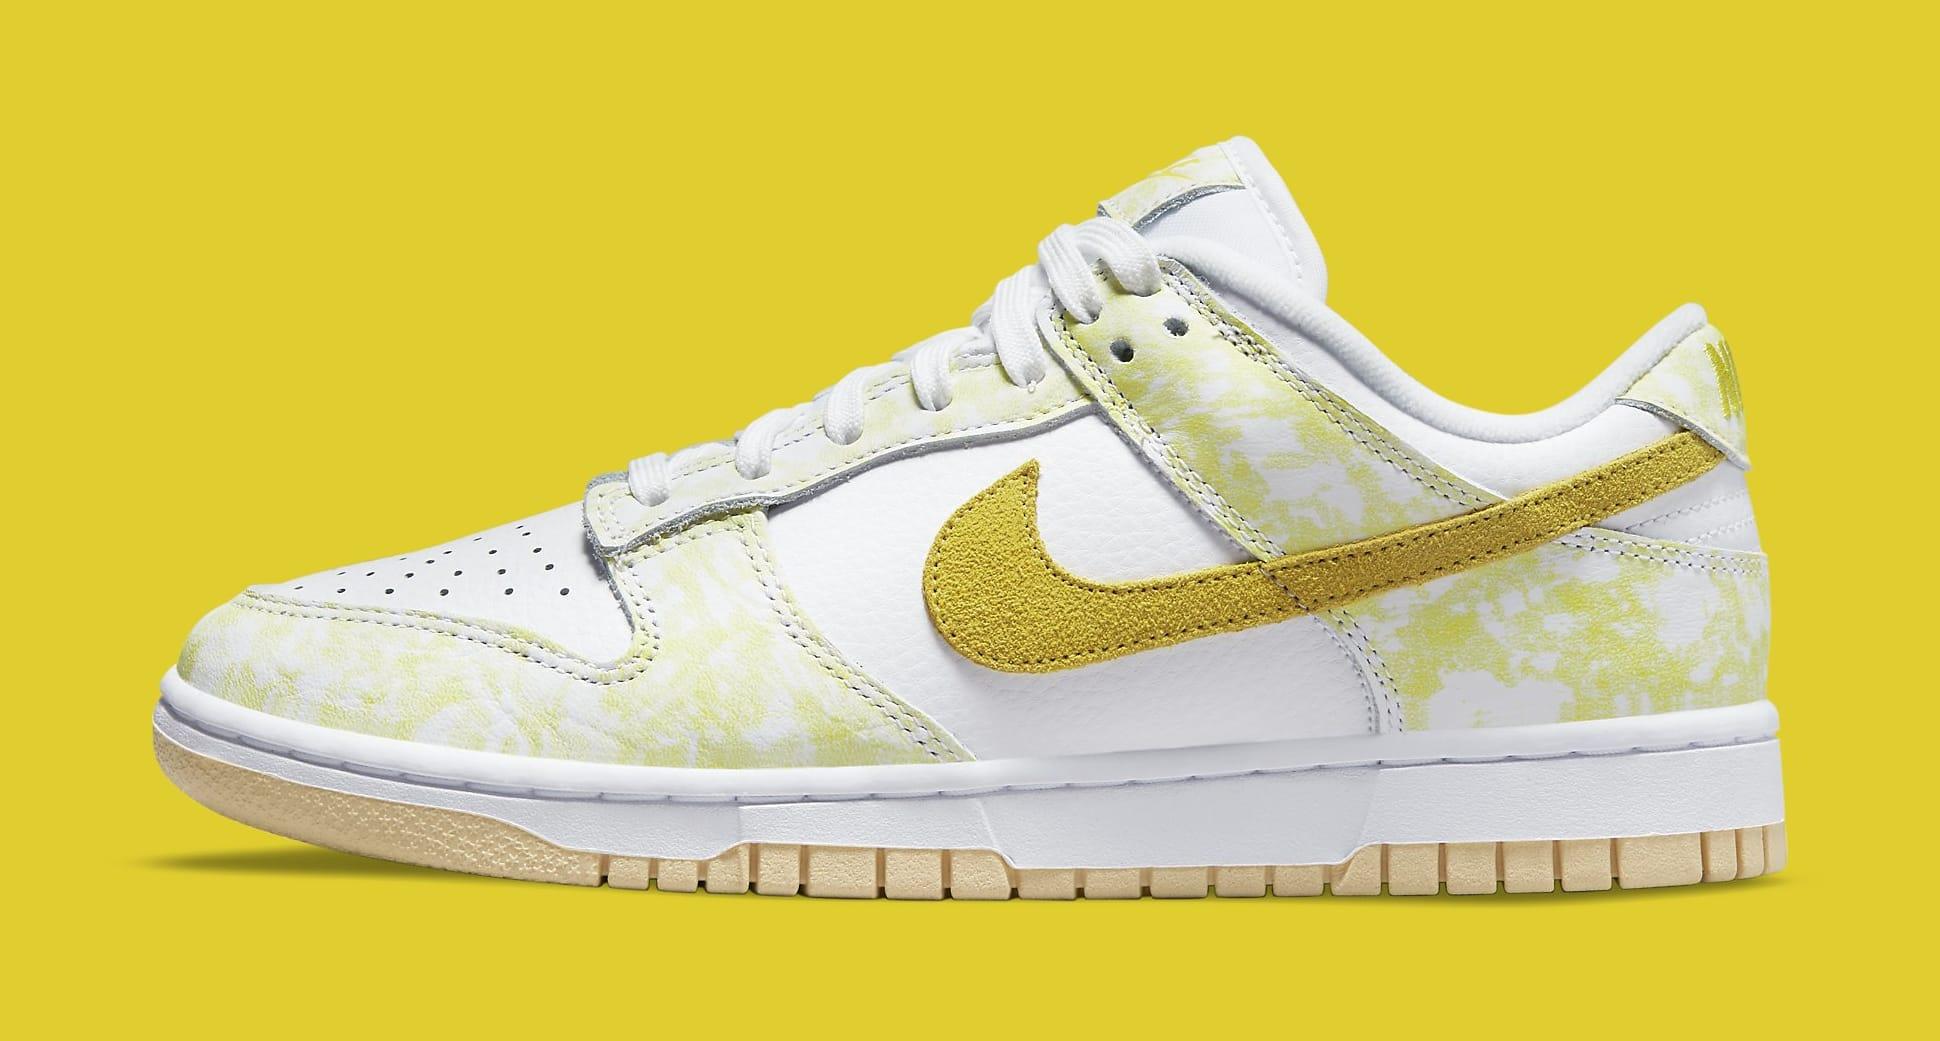 Nike Dunk Low 'Yellow Strike' DM9467-700 Lateral